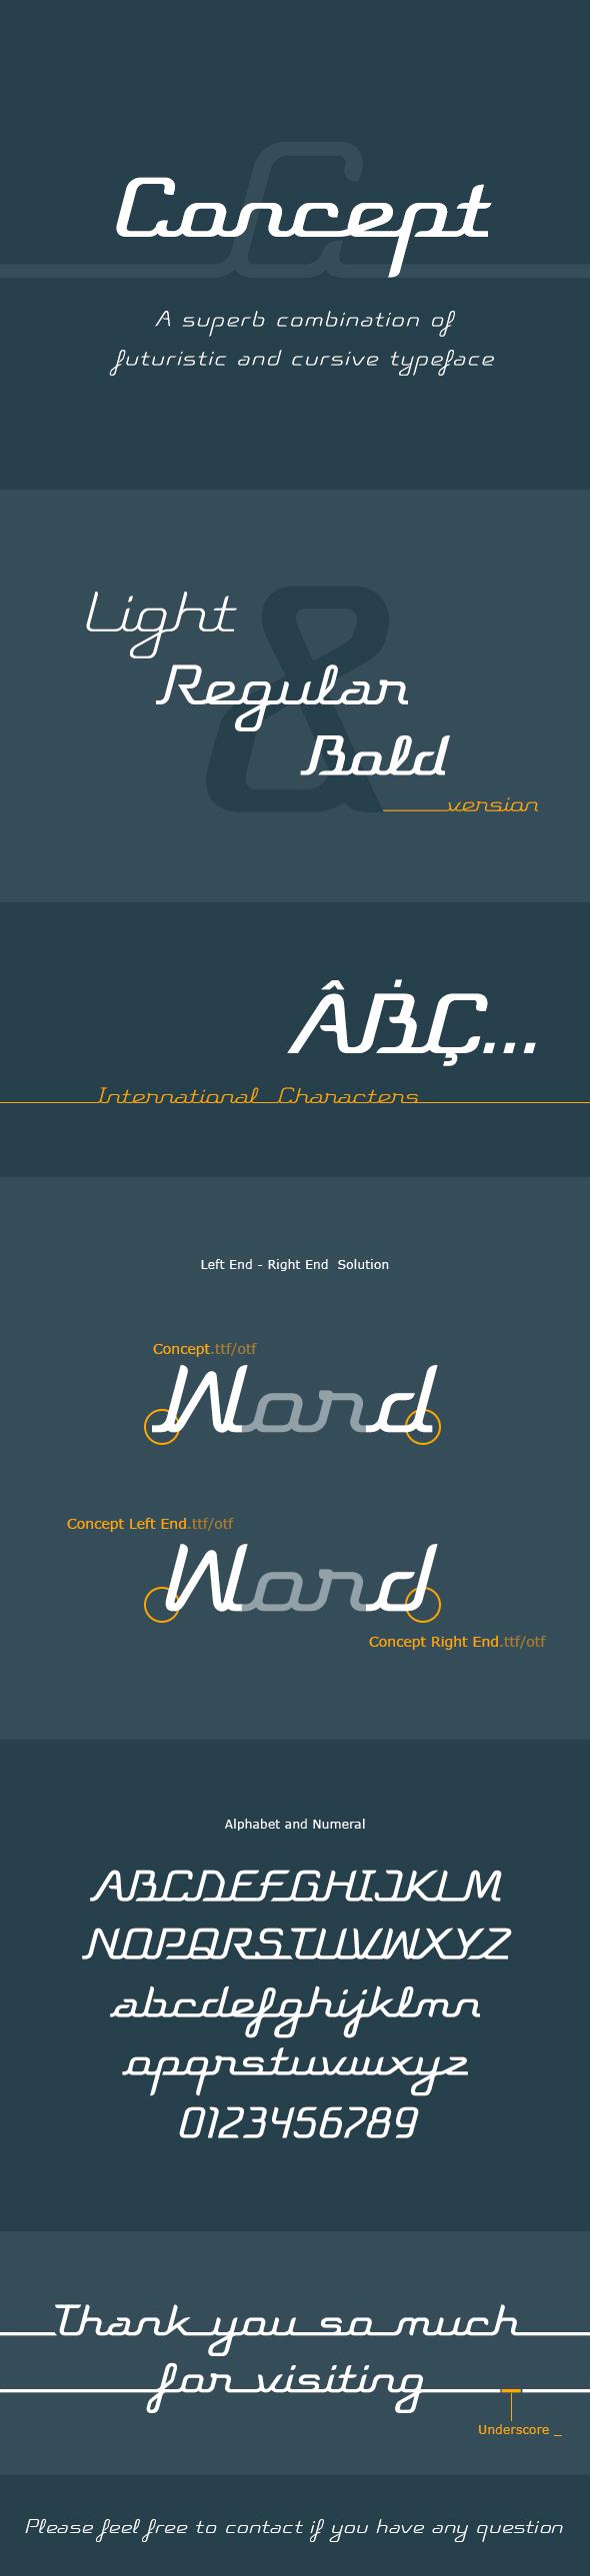 GraphicRiver Concept Typeface 20755940